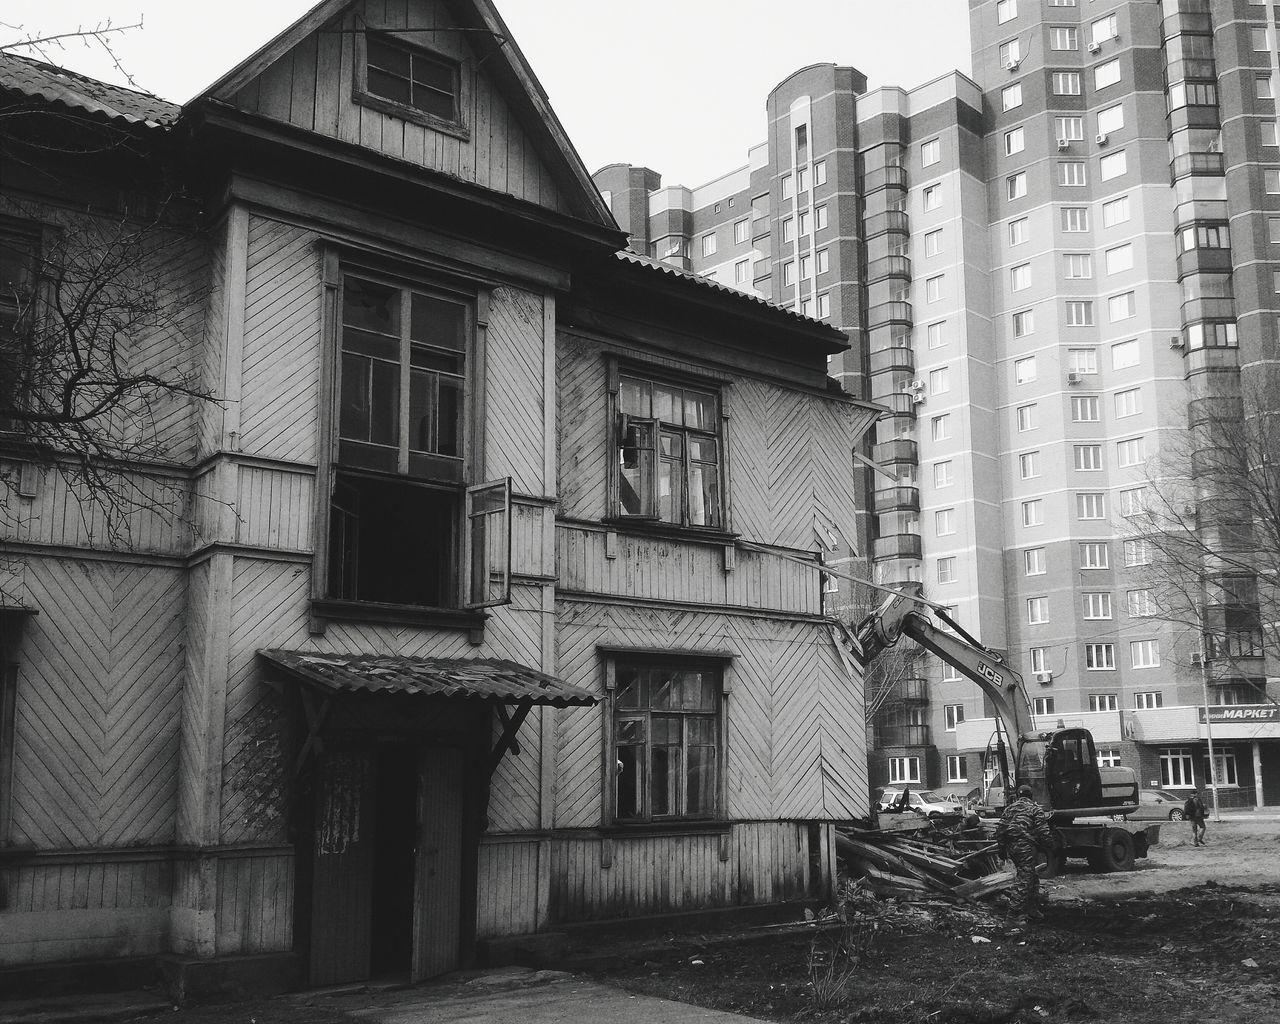 Architecture City Outdoors Day Old House Hello World Interesting 2017 Blackandwhite EyeEm Best Shots - Black + White Goodbye теперь уже прошлое